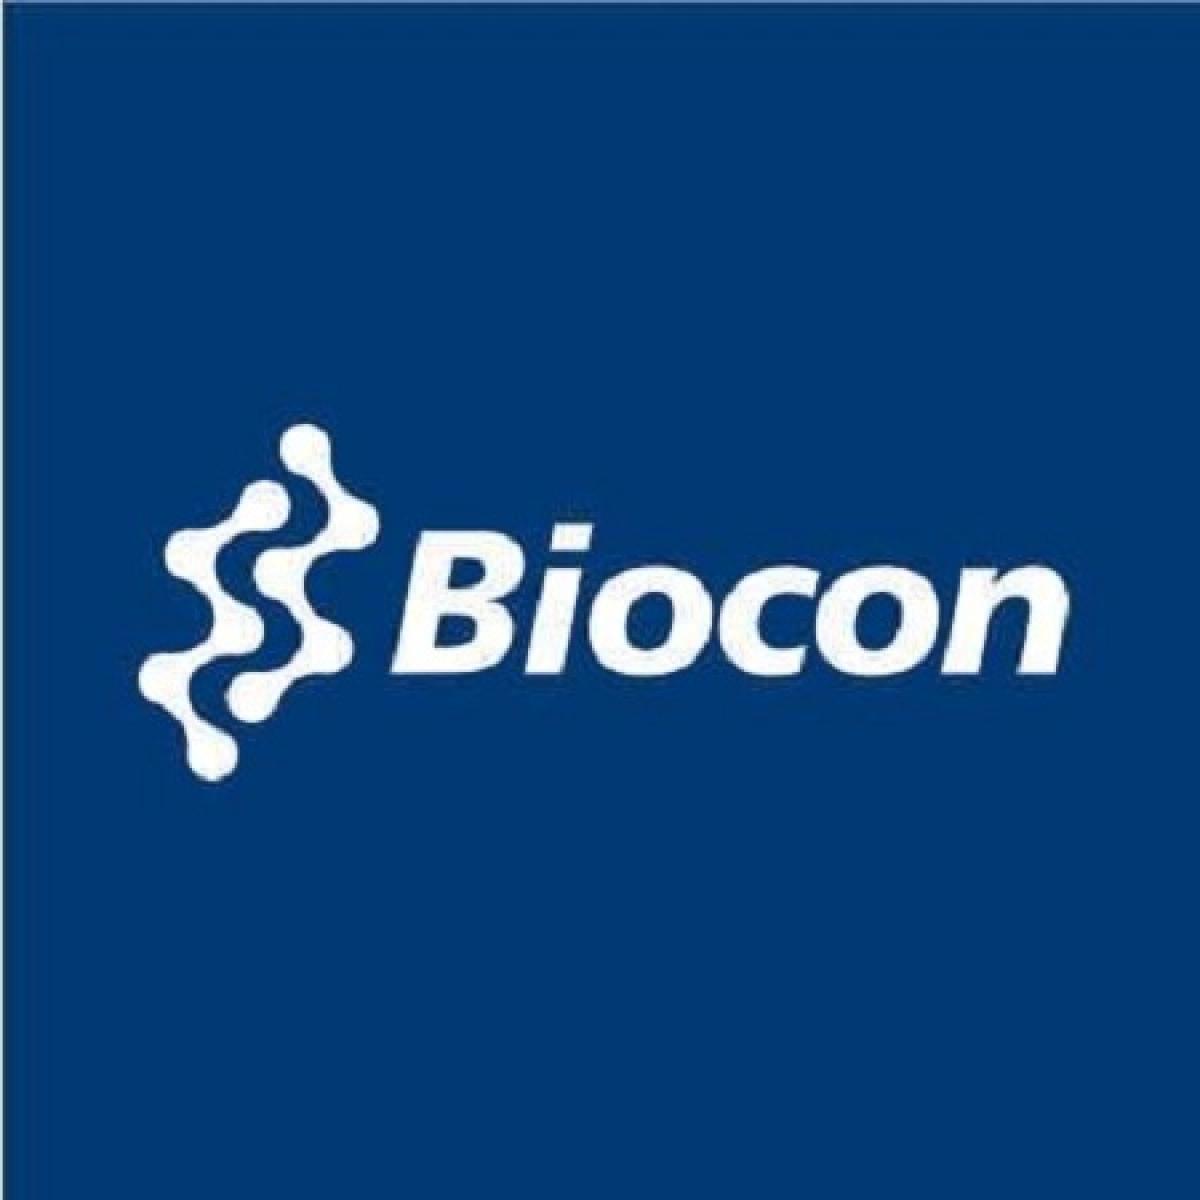 Biocon case: Sebi bans 6 entities for 2 years for manipulative trades